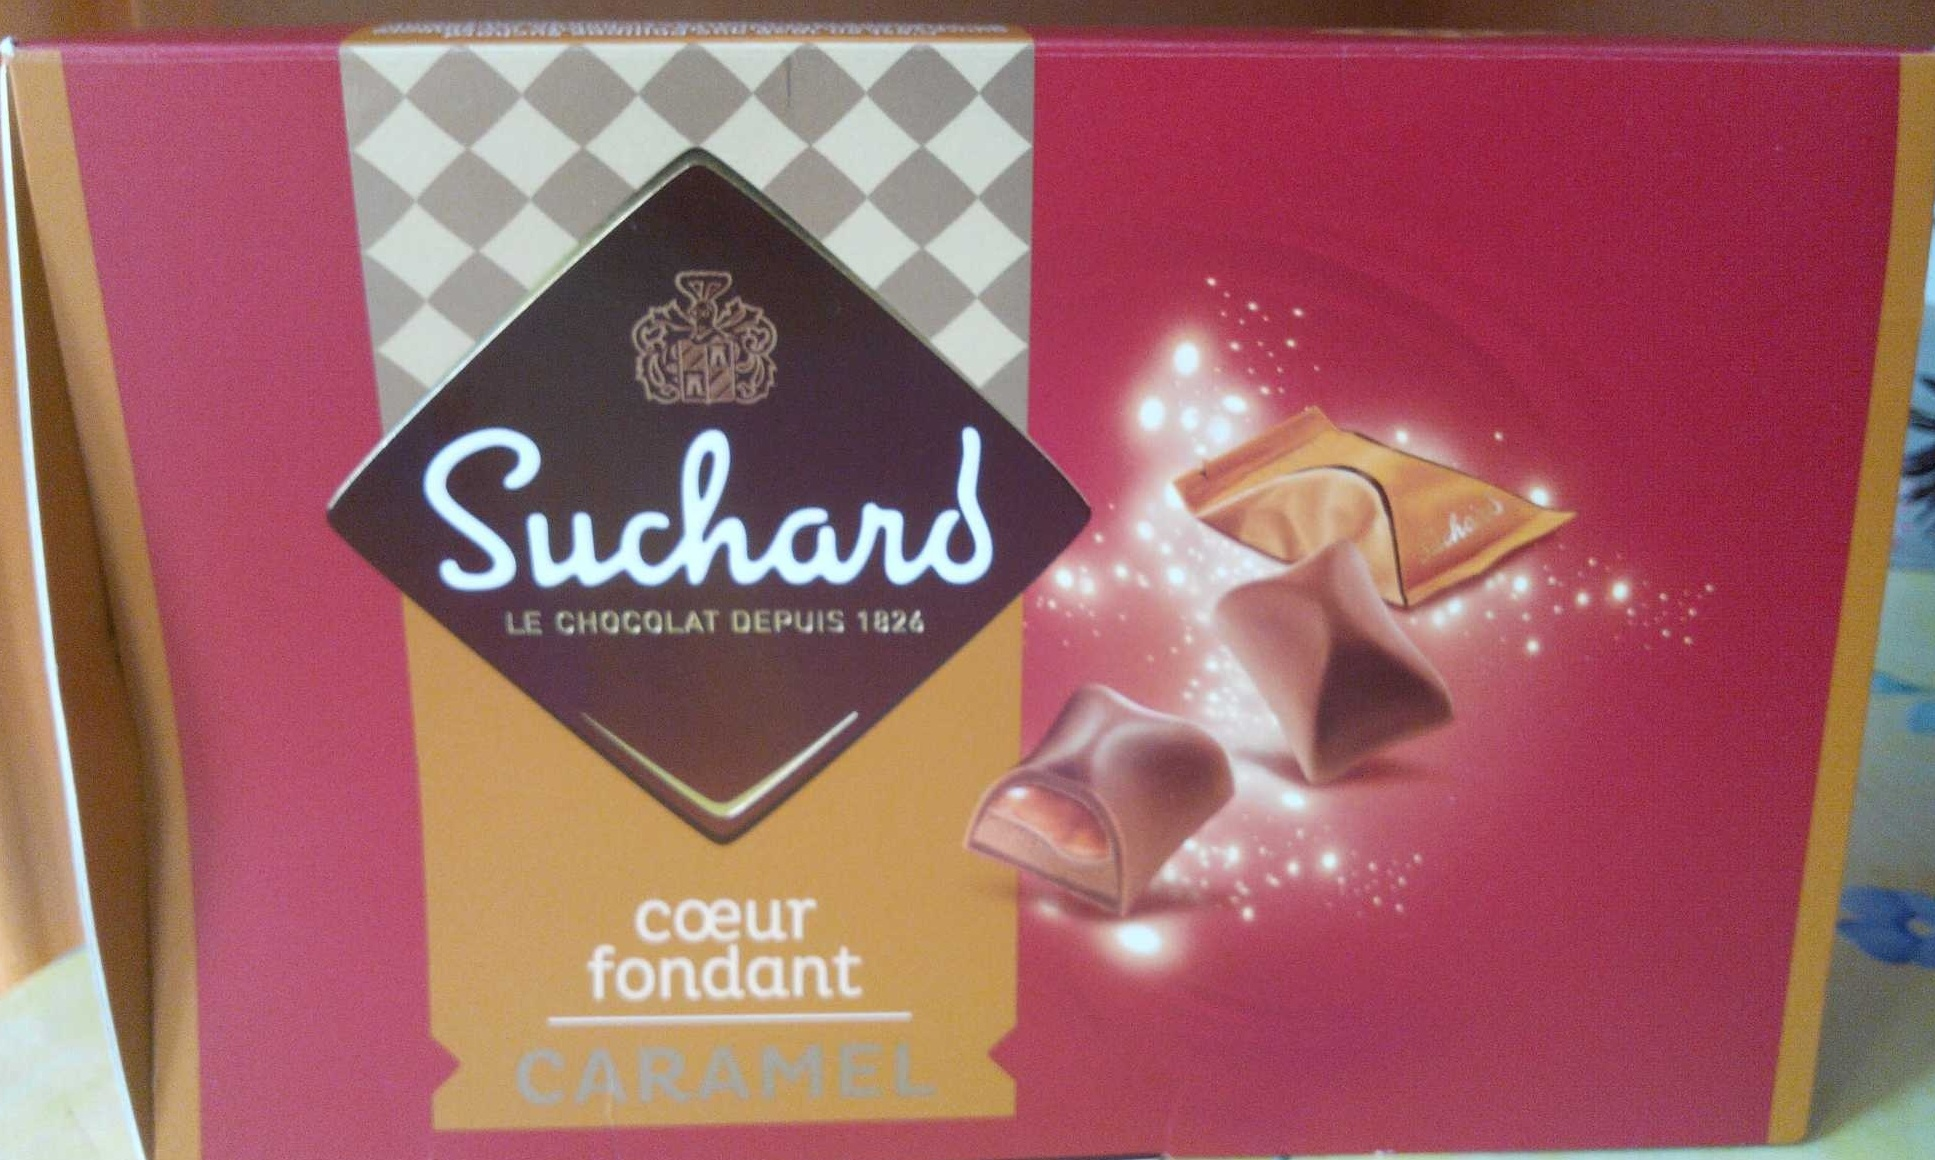 Coeur fondant caramel - Produit - fr